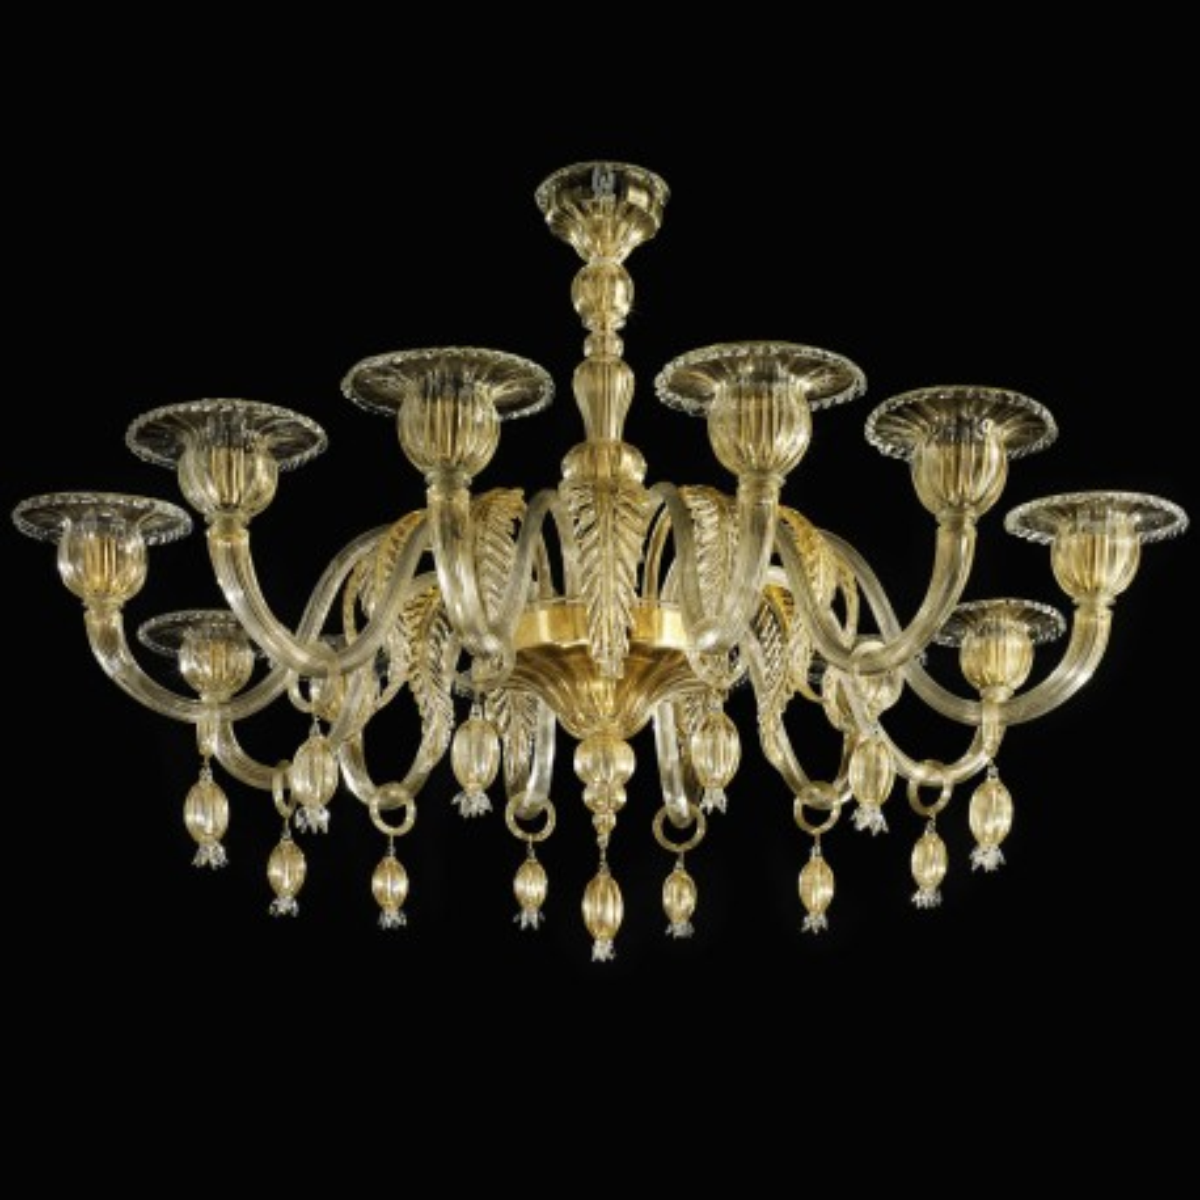 """Orfeo"" lampara de cristal de Murano - 12 luces - color oro"